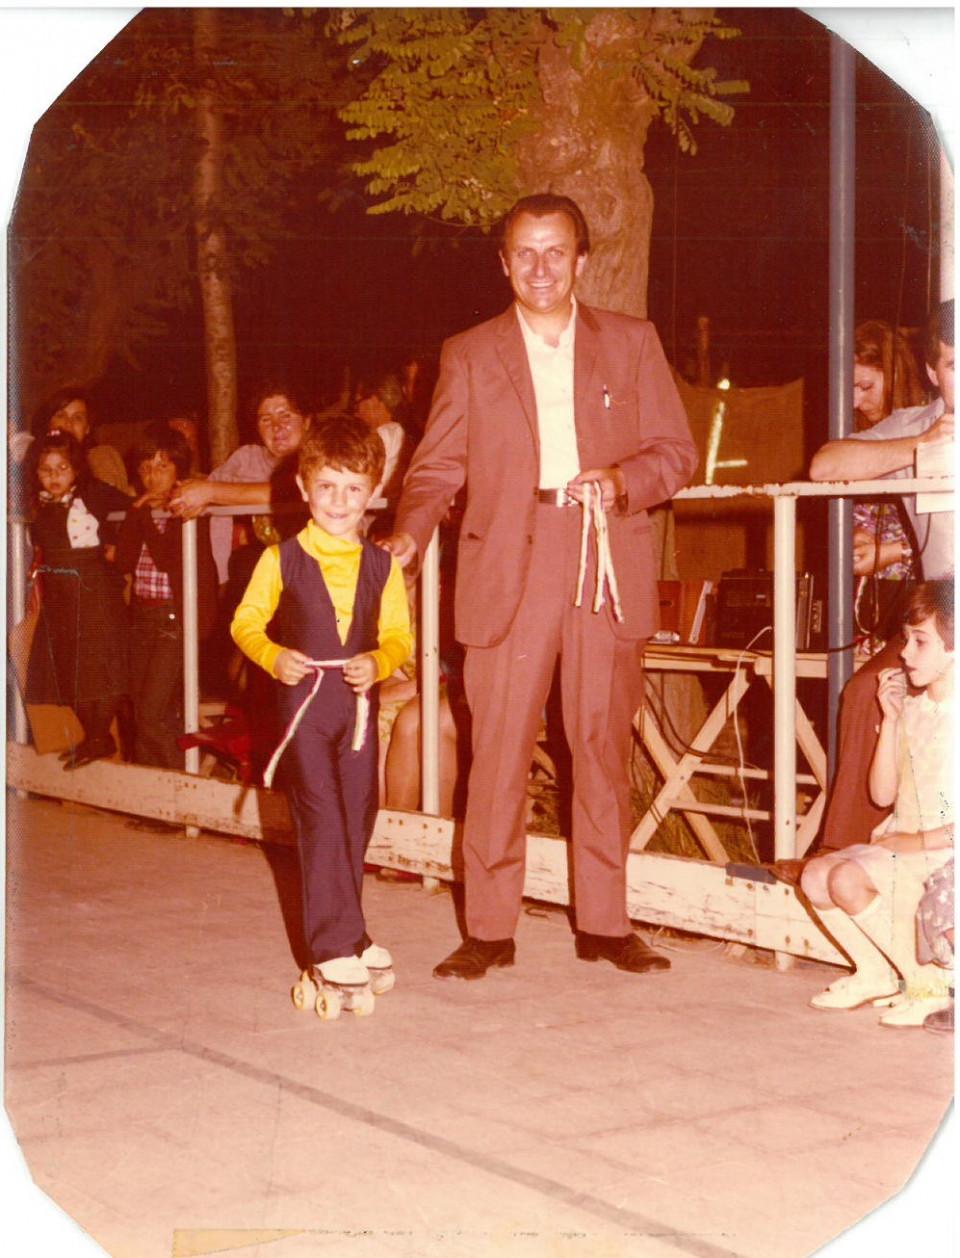 Pattinaggio Calderara, 1976